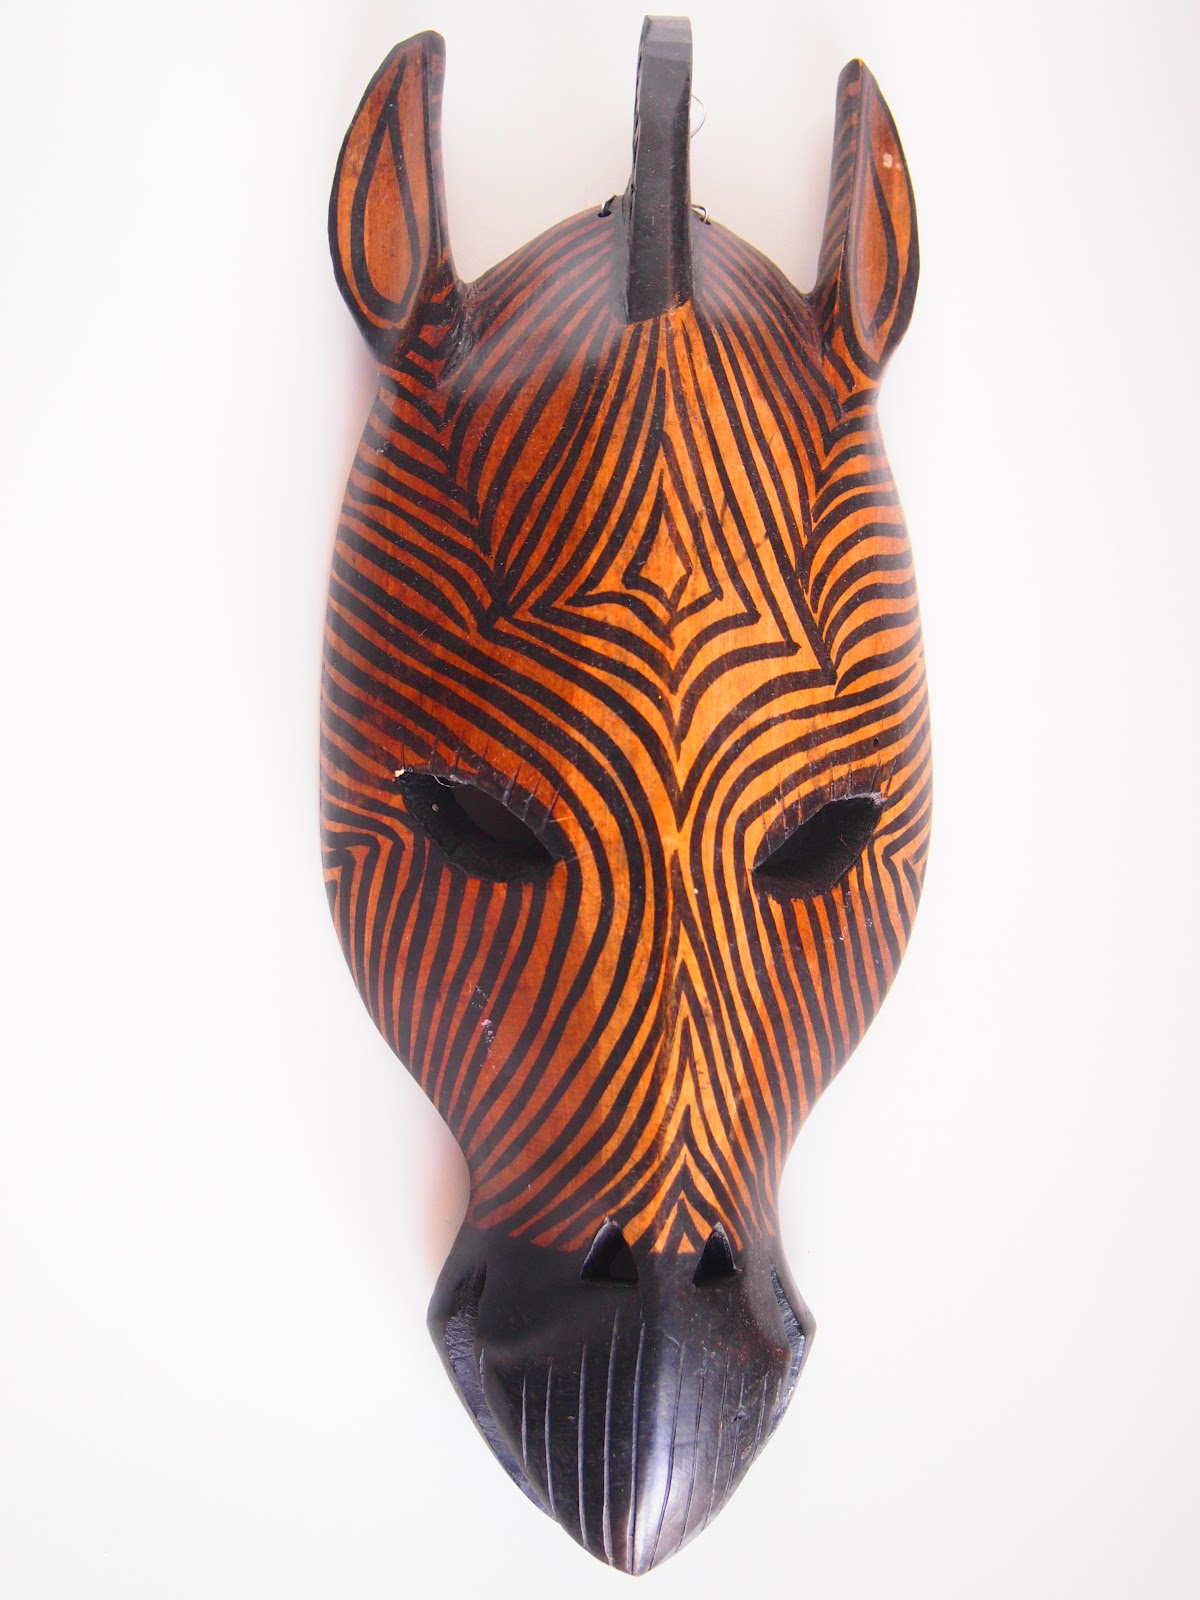 African Animal Mask Templates African animal mask